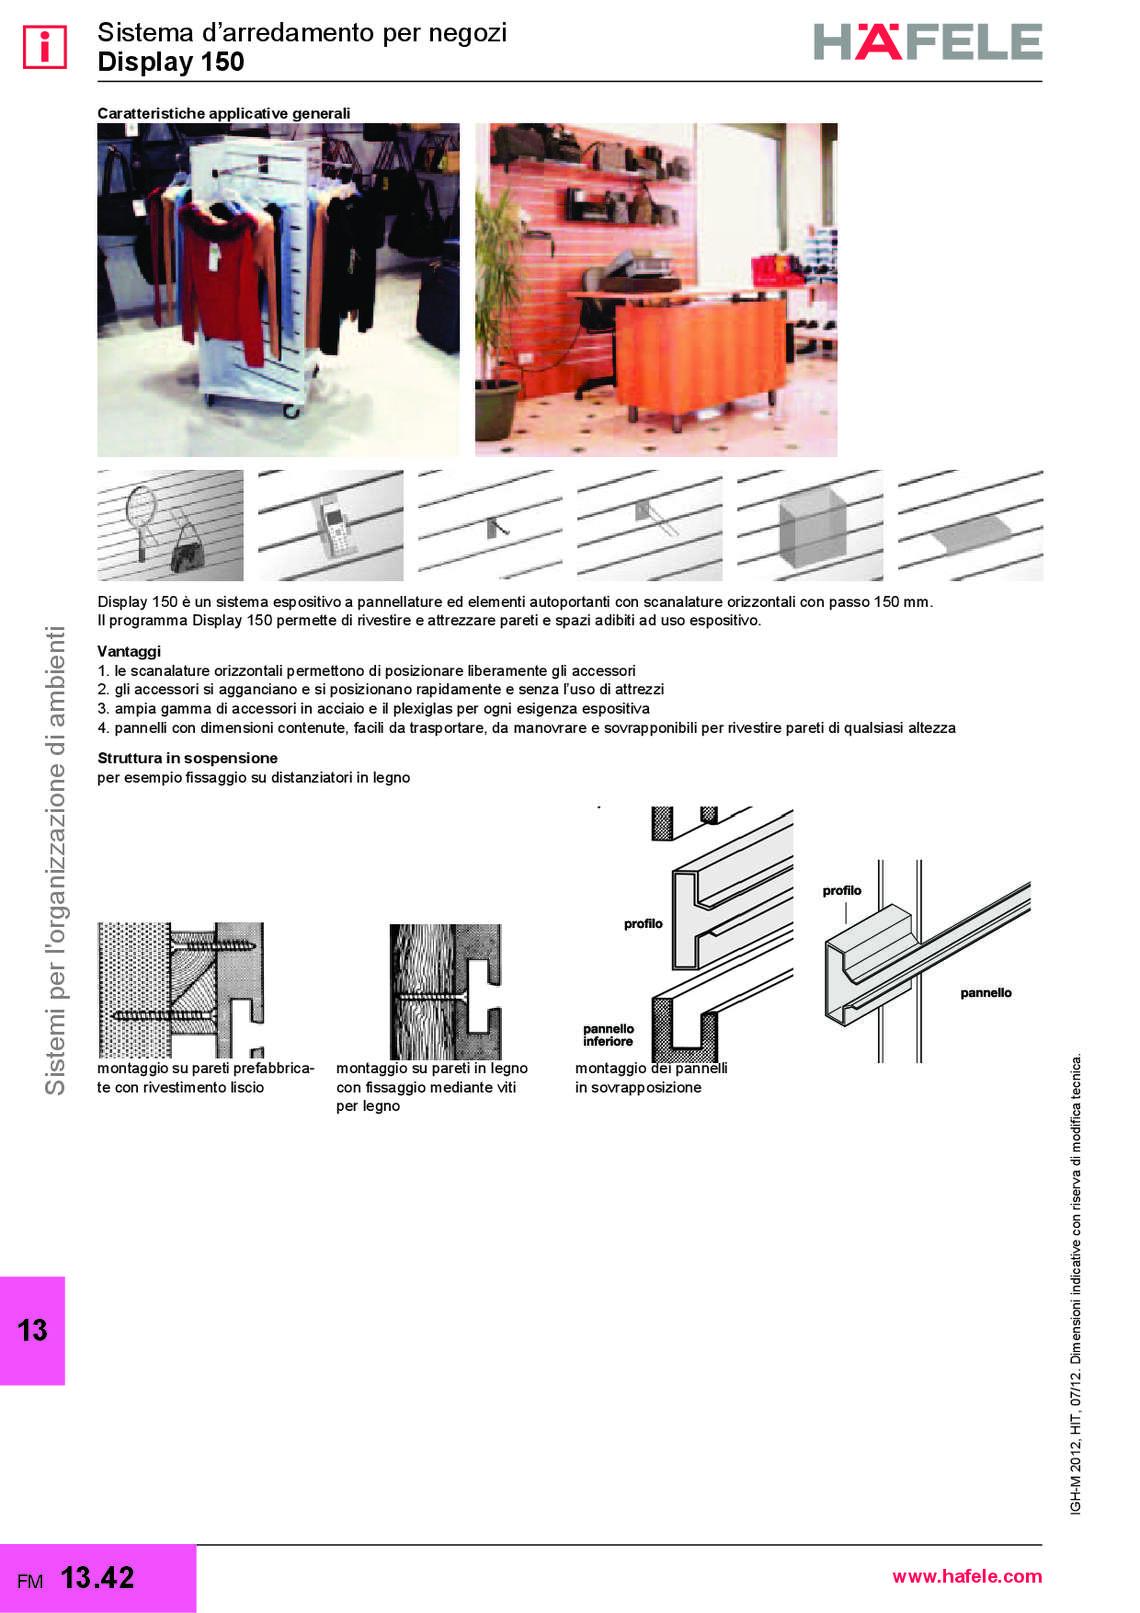 hafele-arredo-negozi-e-farmacie_32_053.jpg